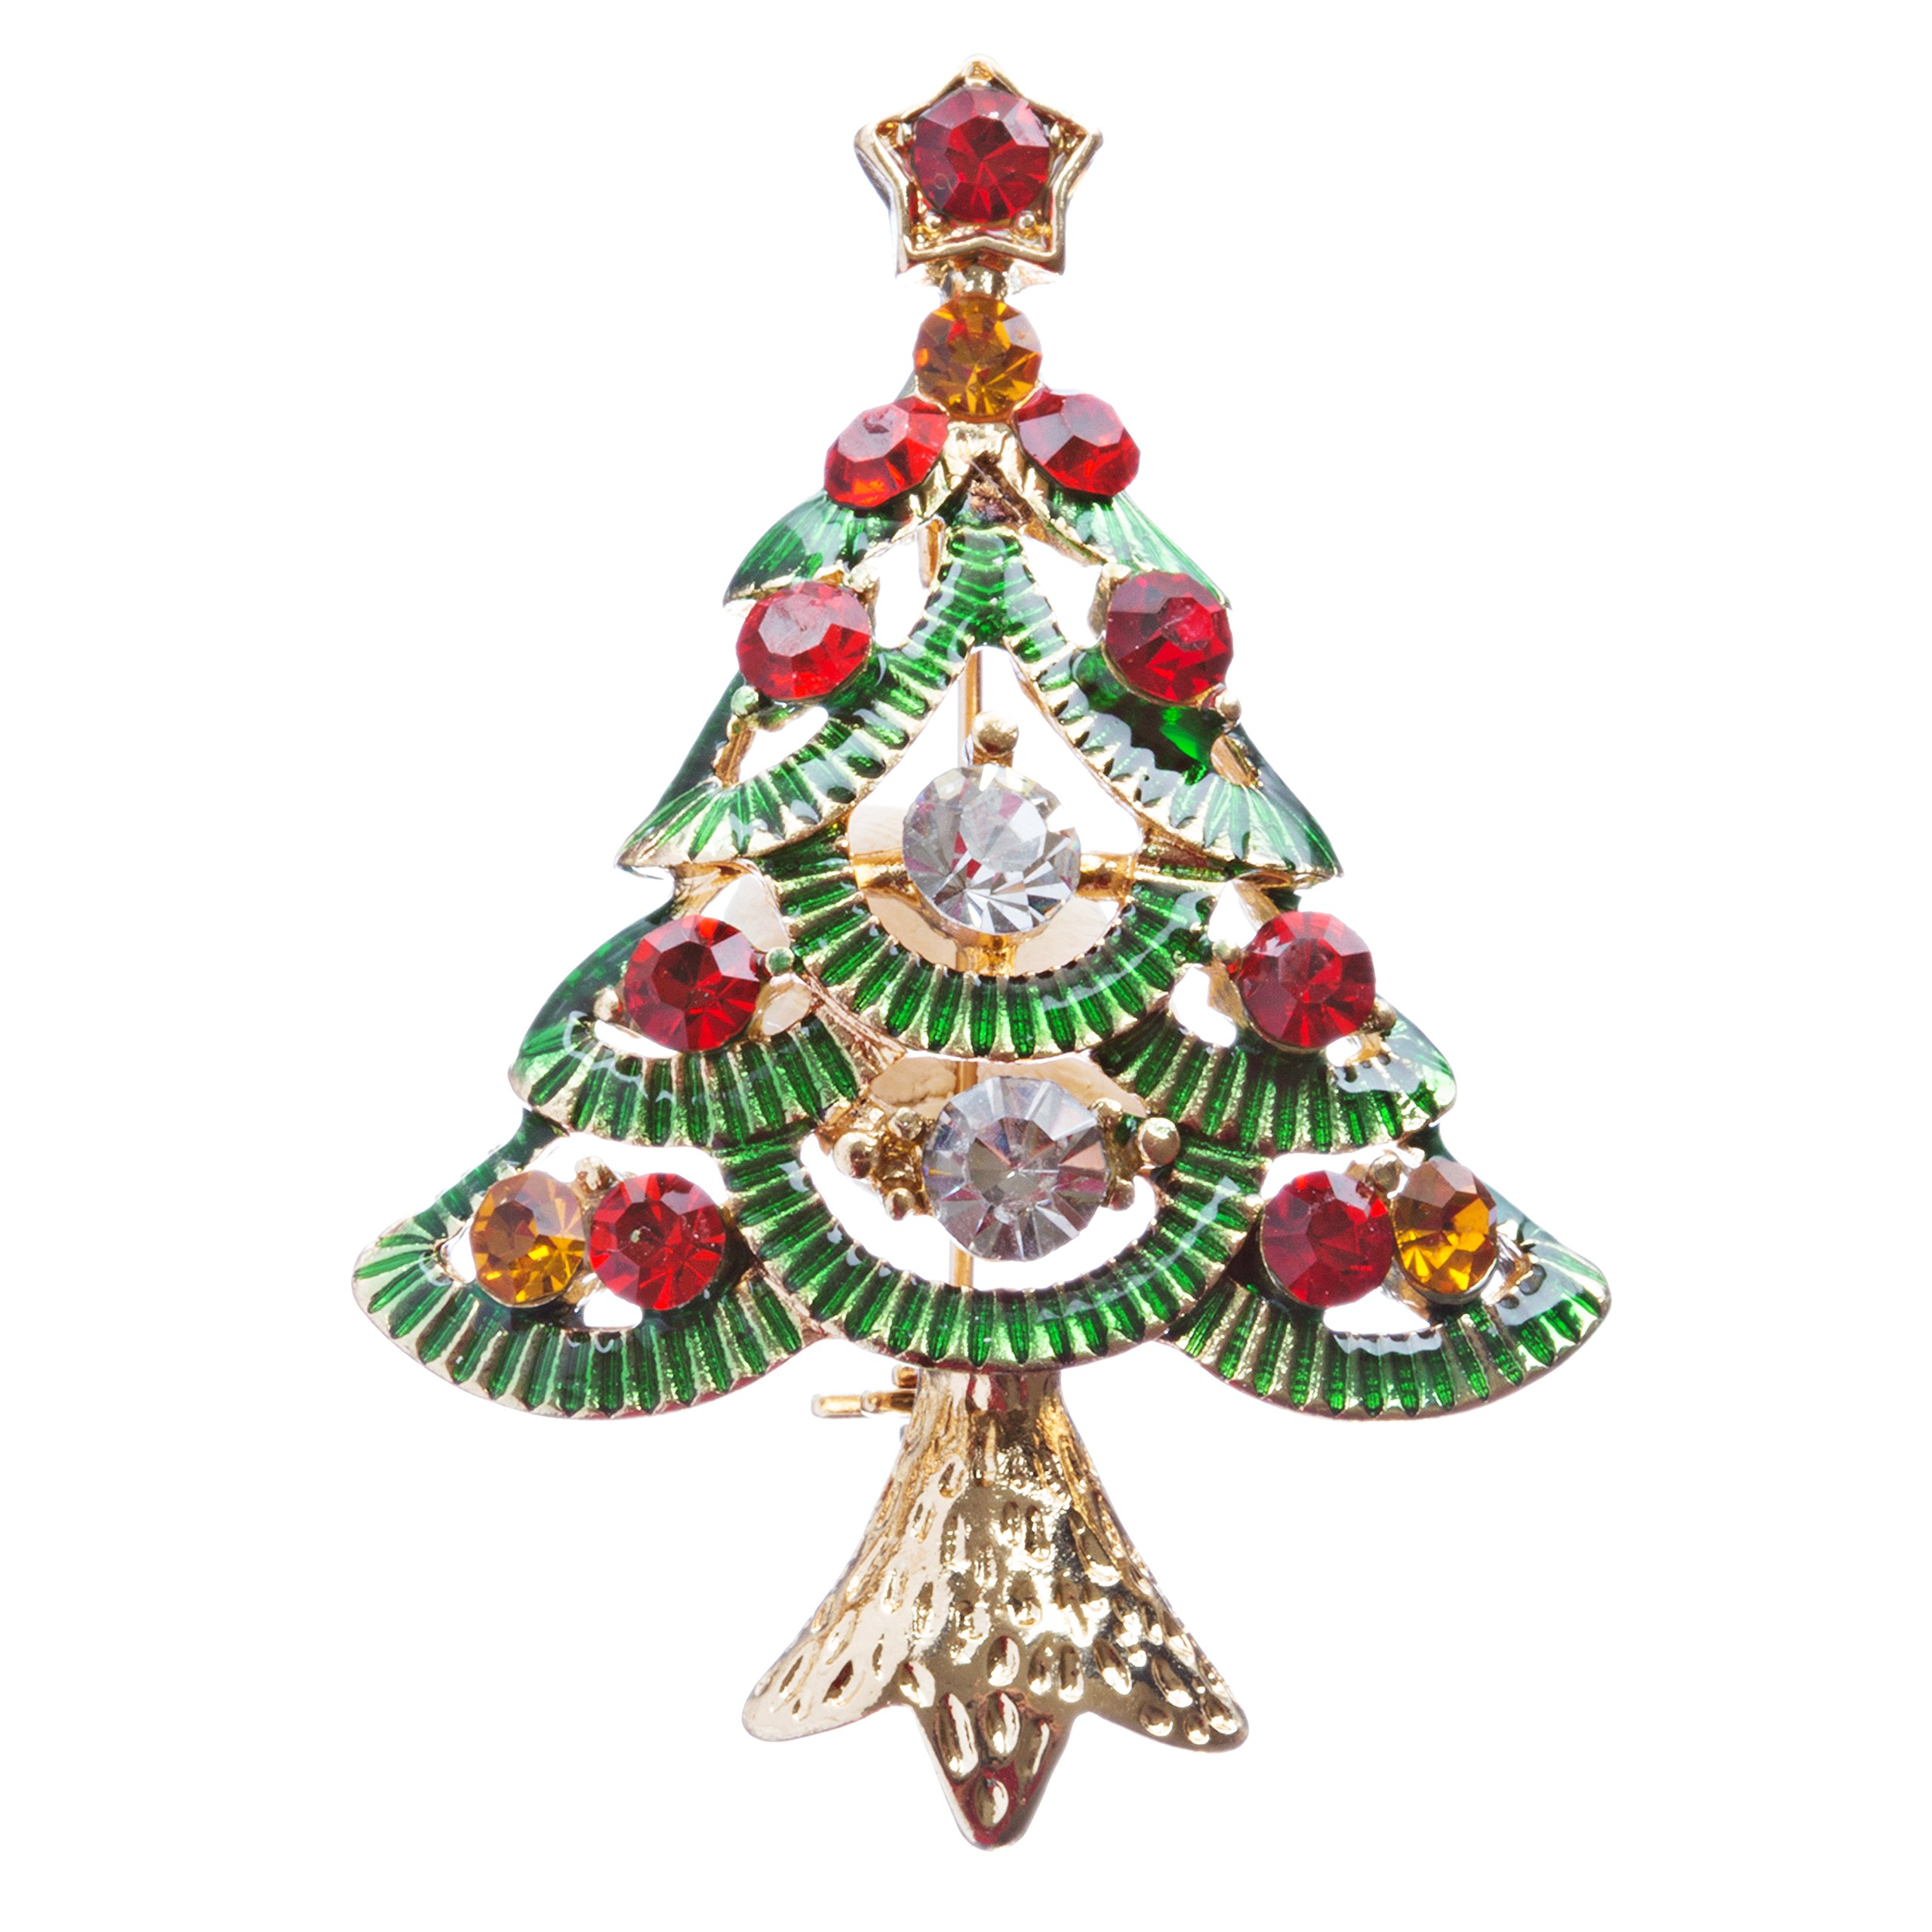 ACCESSORIESFOREVER Christmas Jewelry Crystal Rhinestone Glamorous Holiday Tree Brooch Pin B141 MT